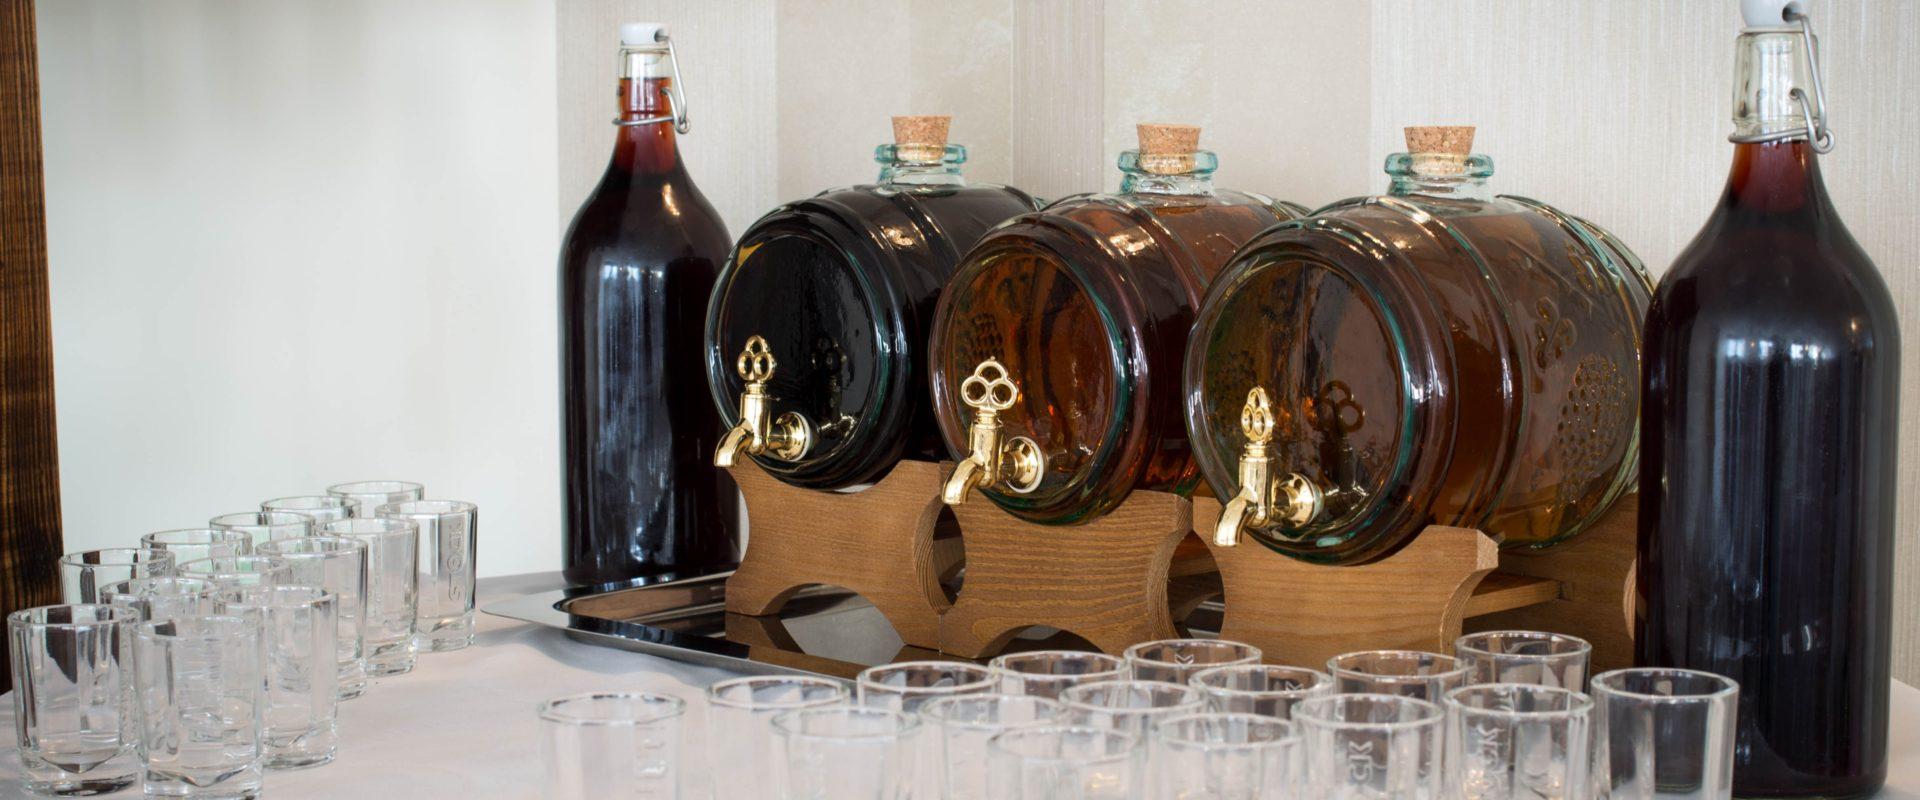 bar alkoholowy